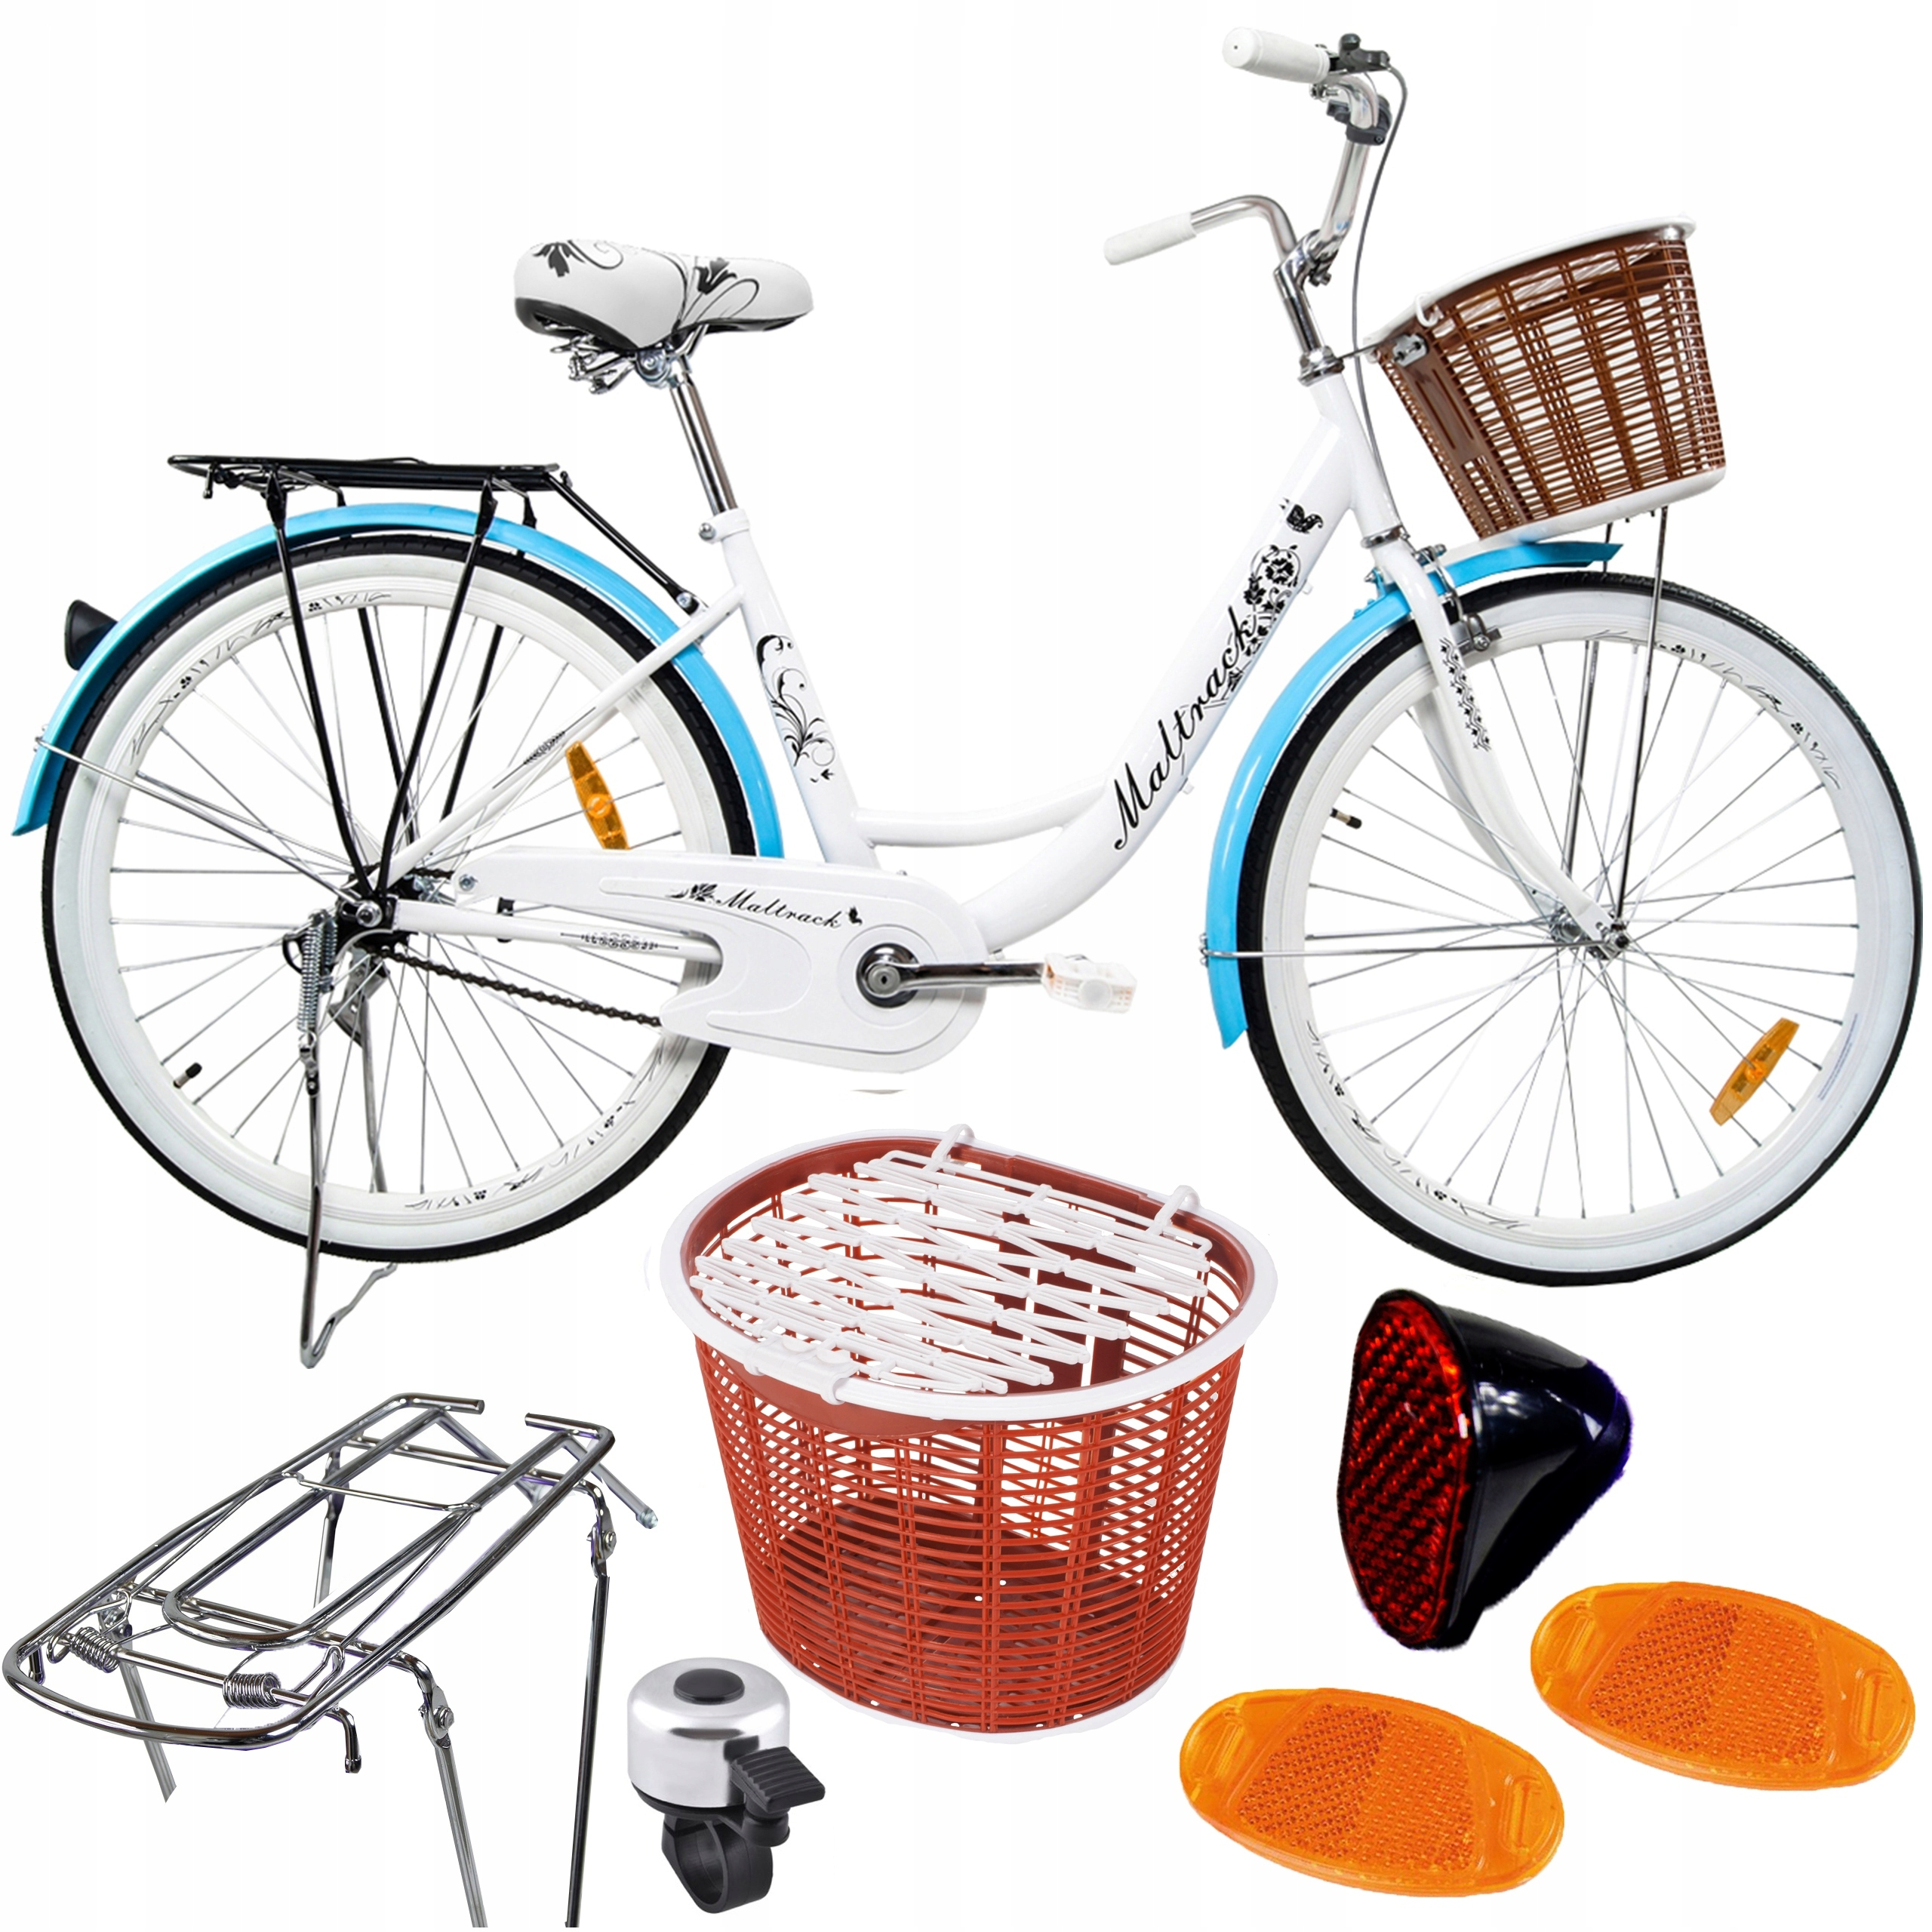 BIKE MIEJSKI 26 '' Citybike BIELY kufrík na koše